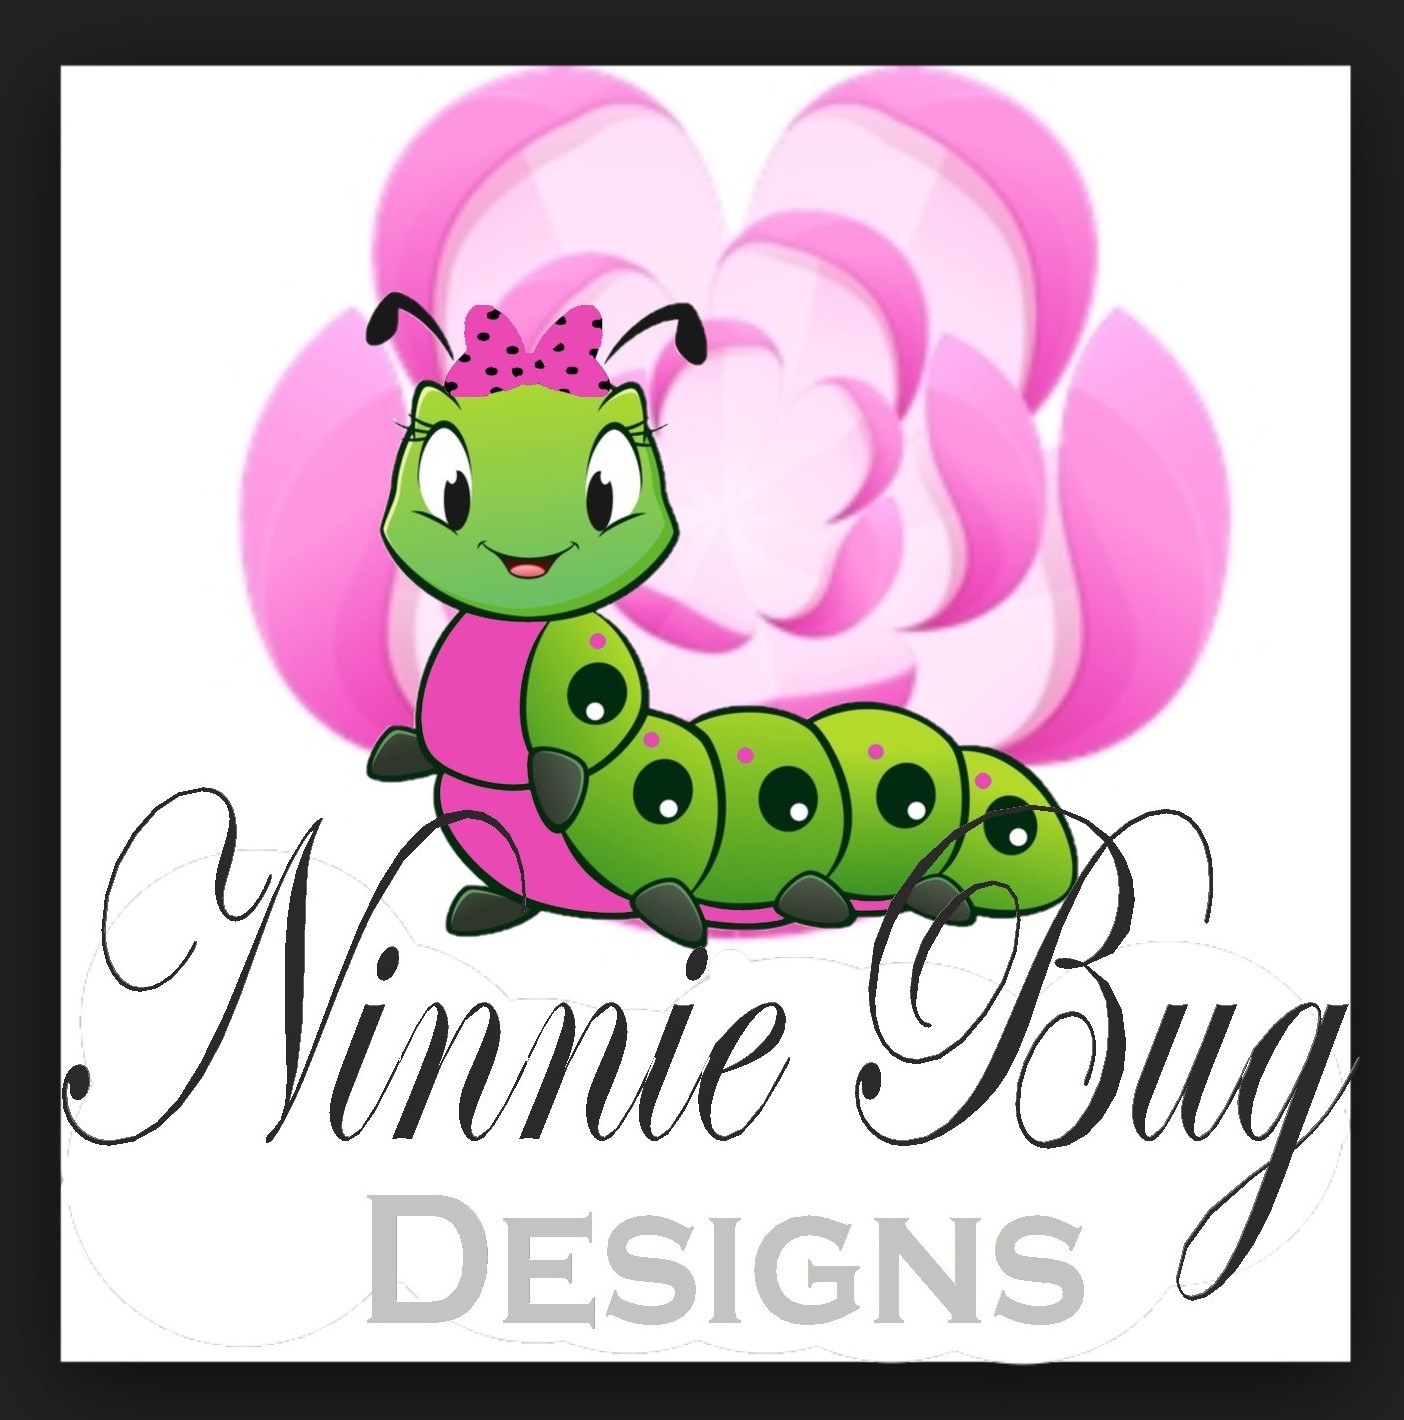 Ninnie Bug Designs Wedding bouquet specialists